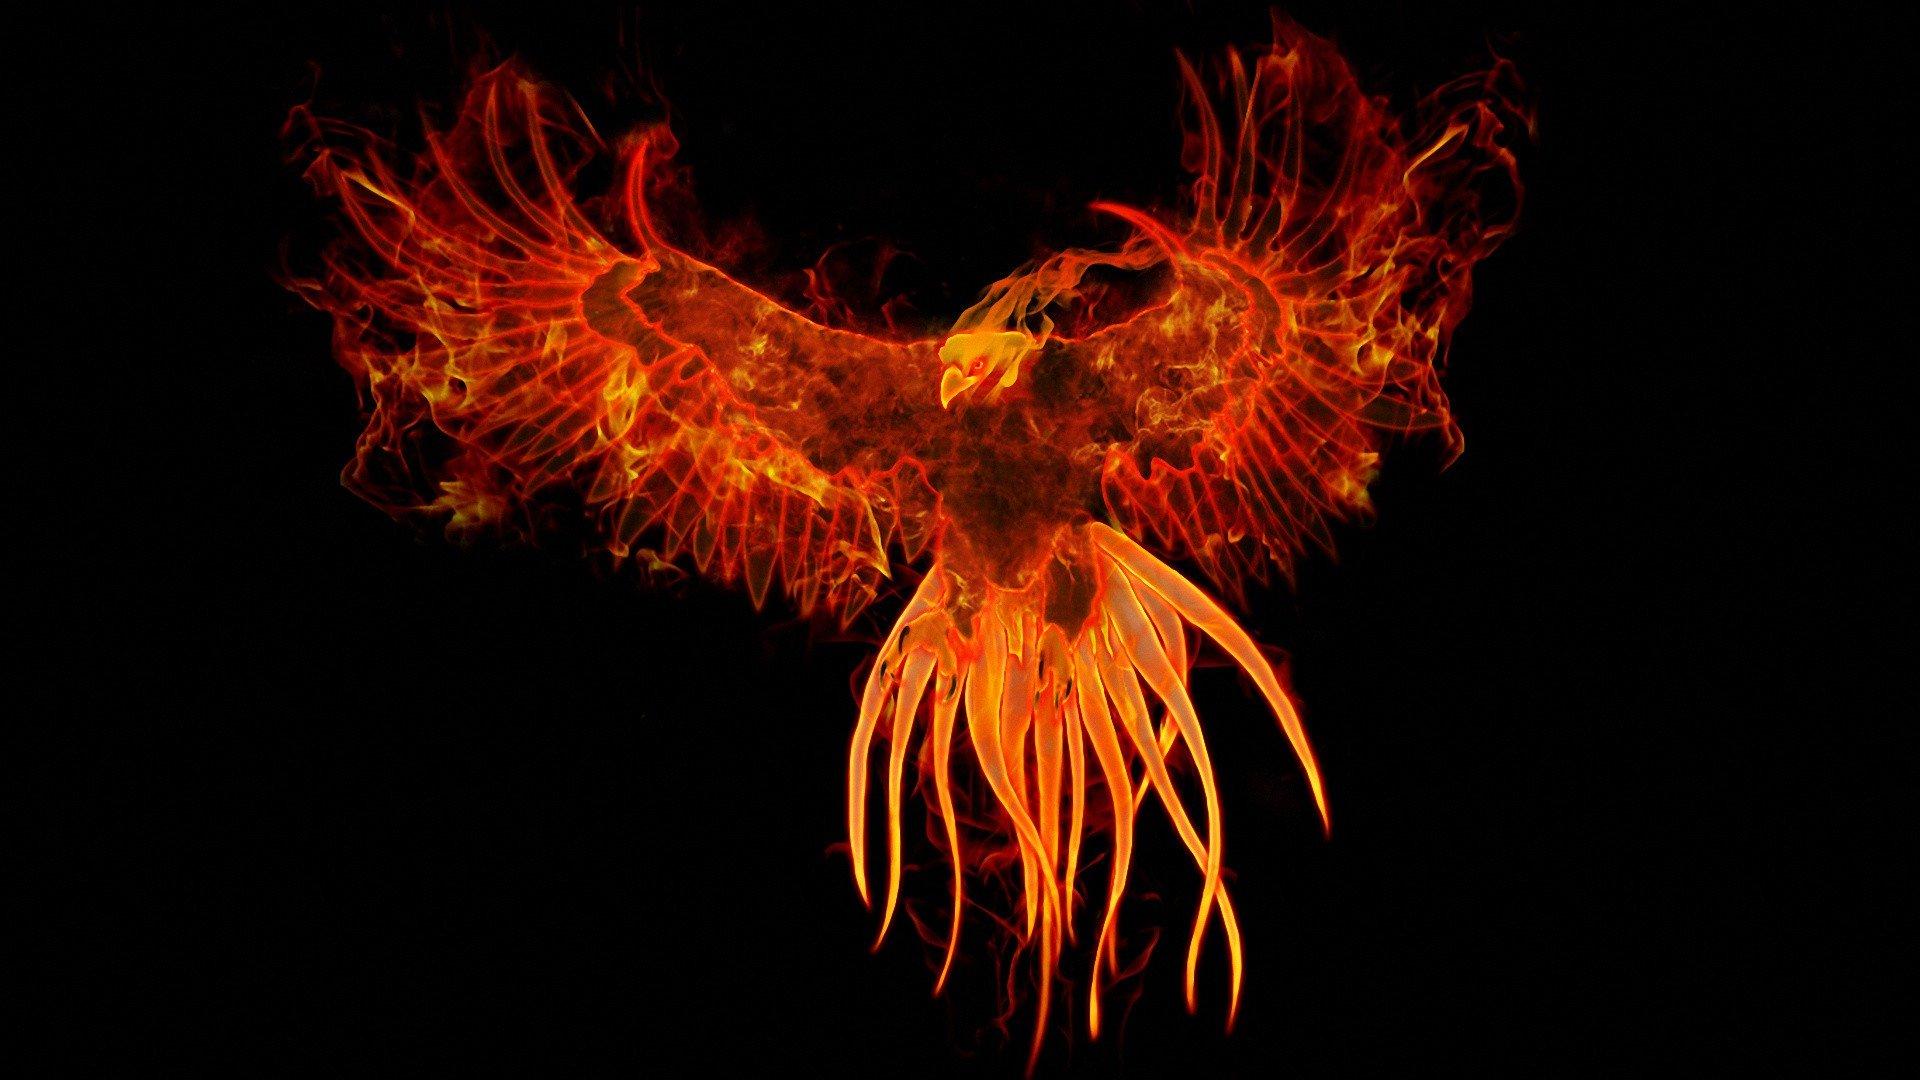 Painting Art Phoenix Fire Fantasy Digital Drawing: Birds Fire Phoenix Fantasy Art Digital Art Artwork